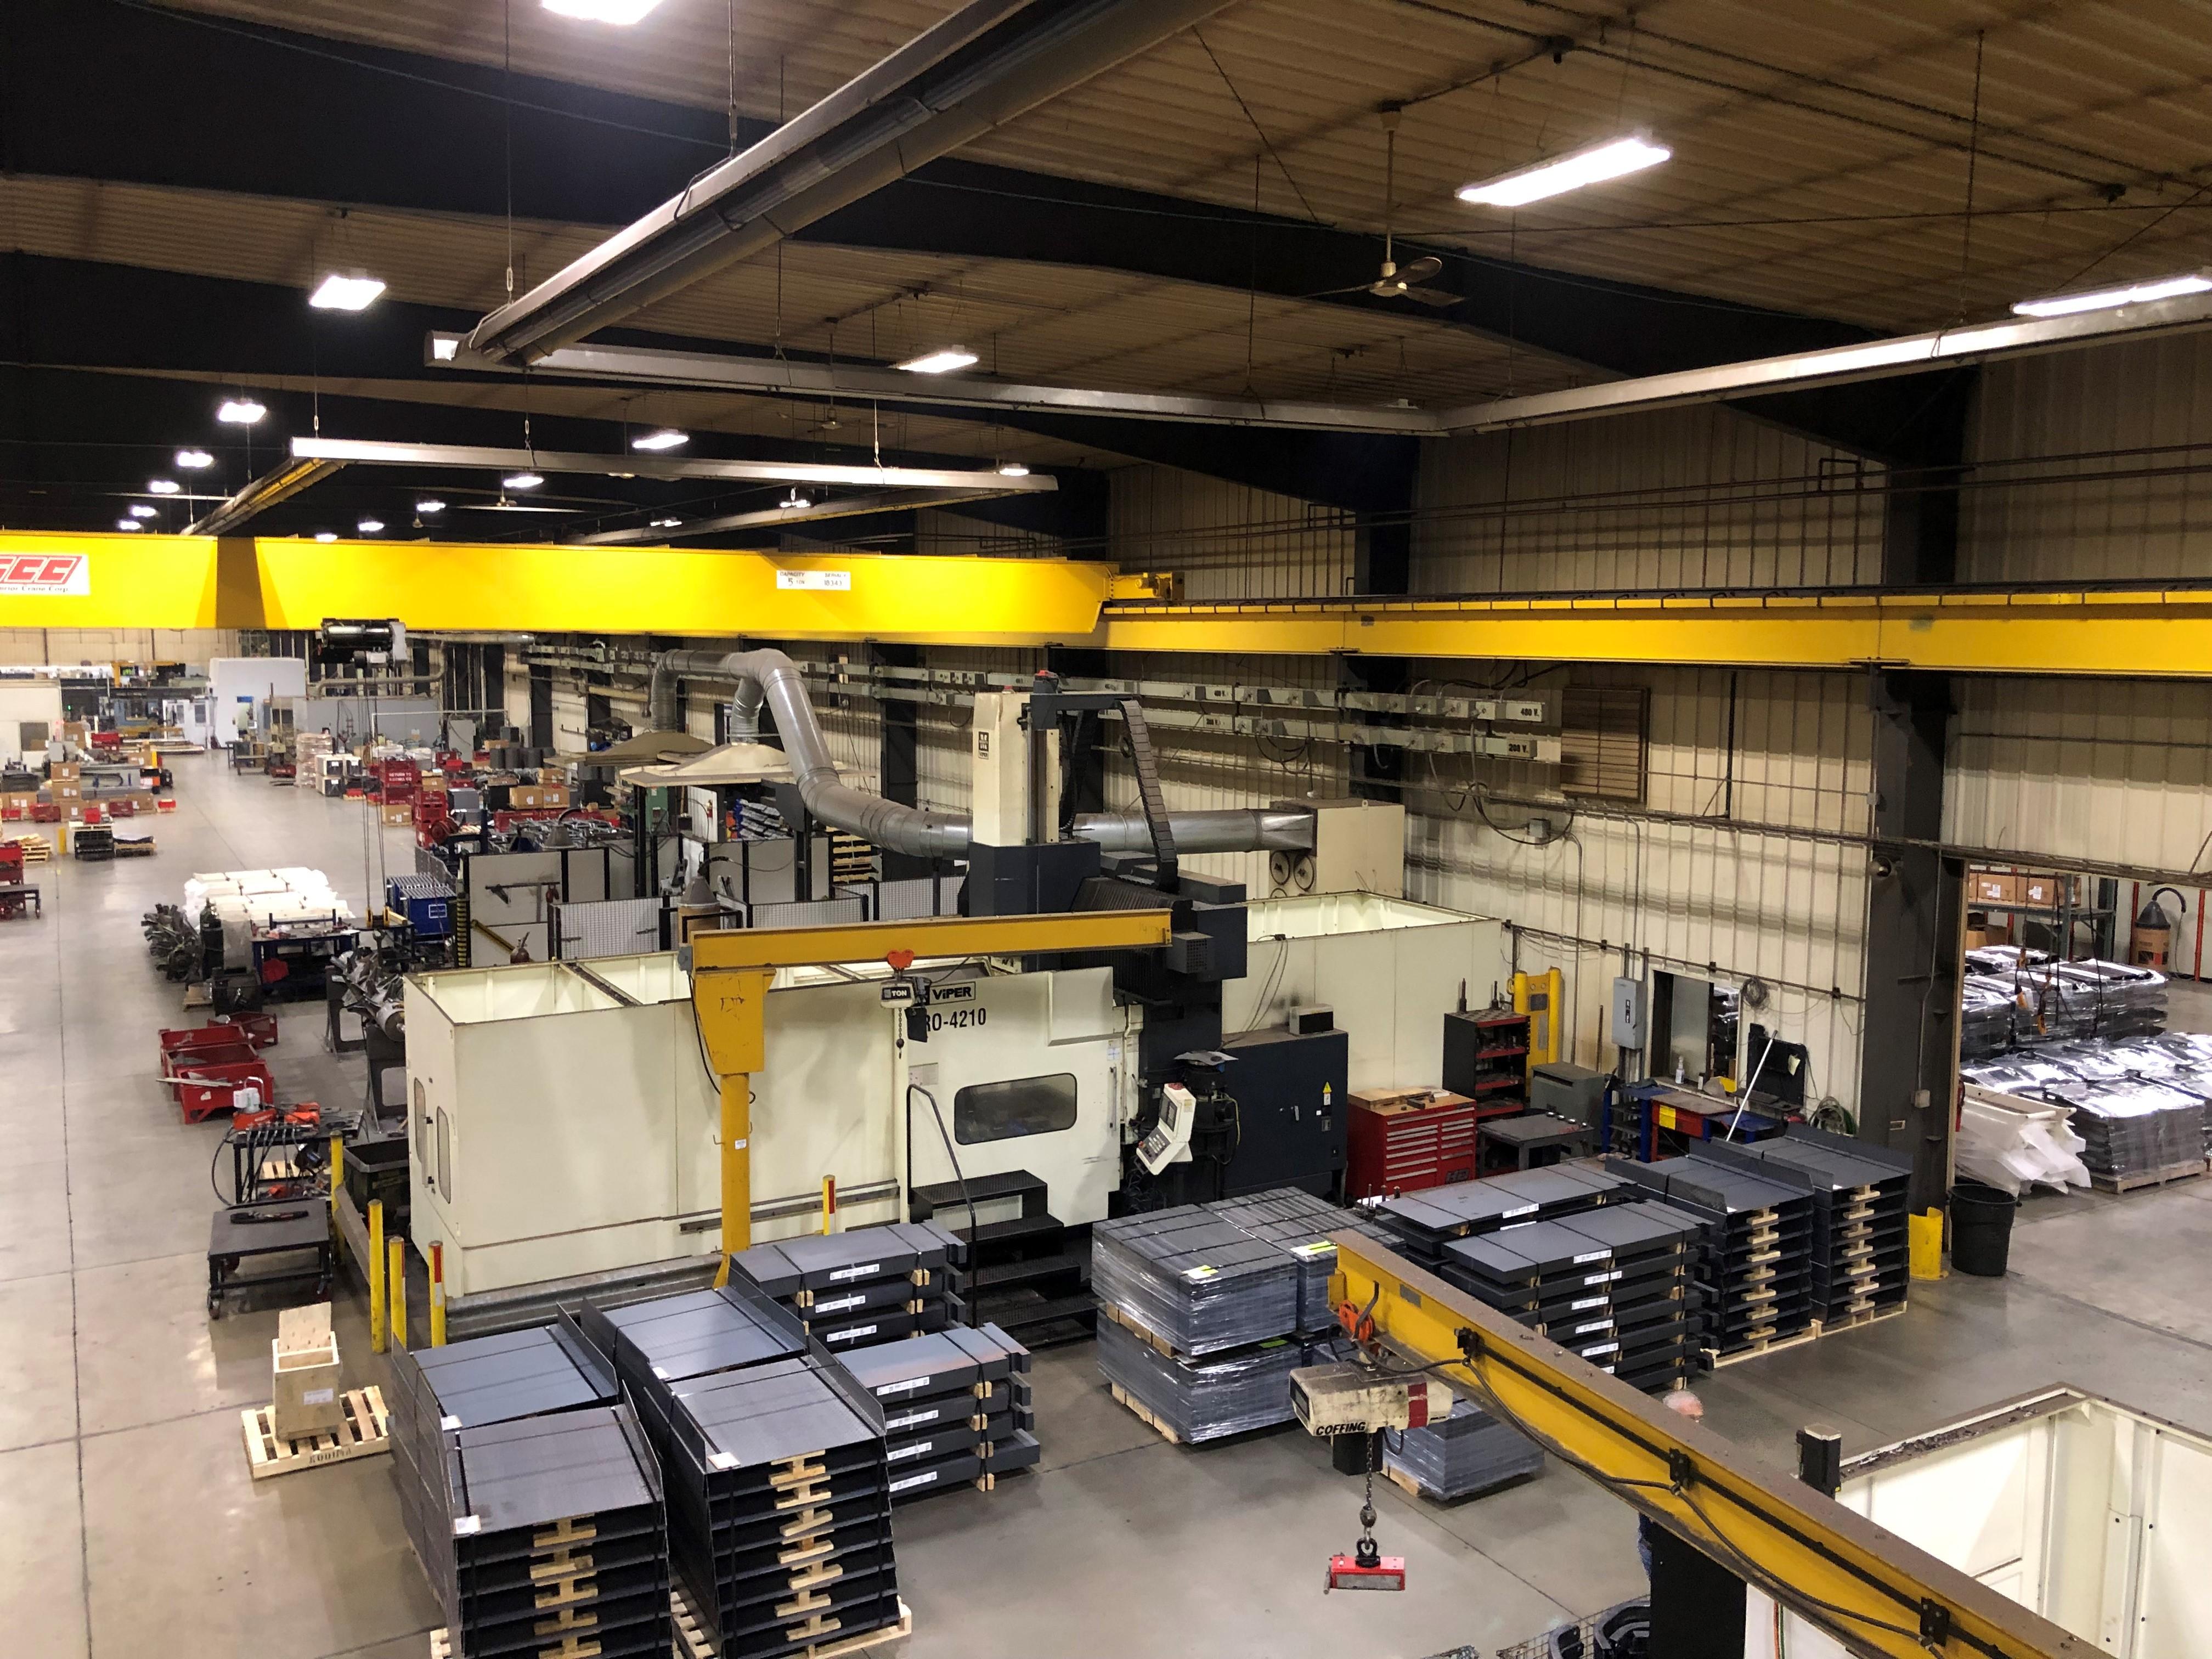 "Viper Pro 4210 AG Bridge Type CNC Vertical Milling Center, 163"" x 78"" Table, Right Angle Head, 40ATC"